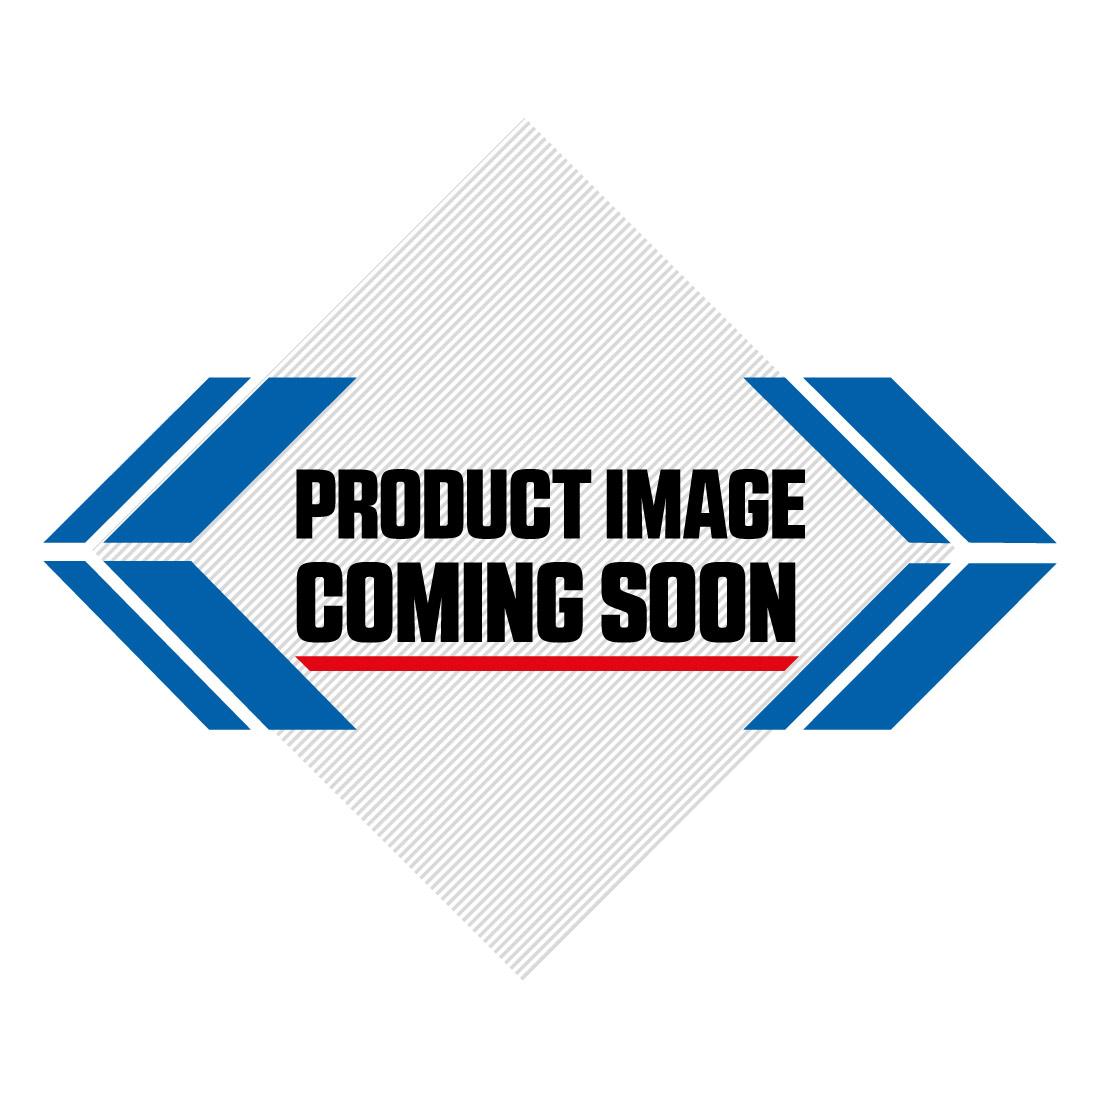 Suzuki Plastic Kit RMZ 450 (08-17) Black Image-1>